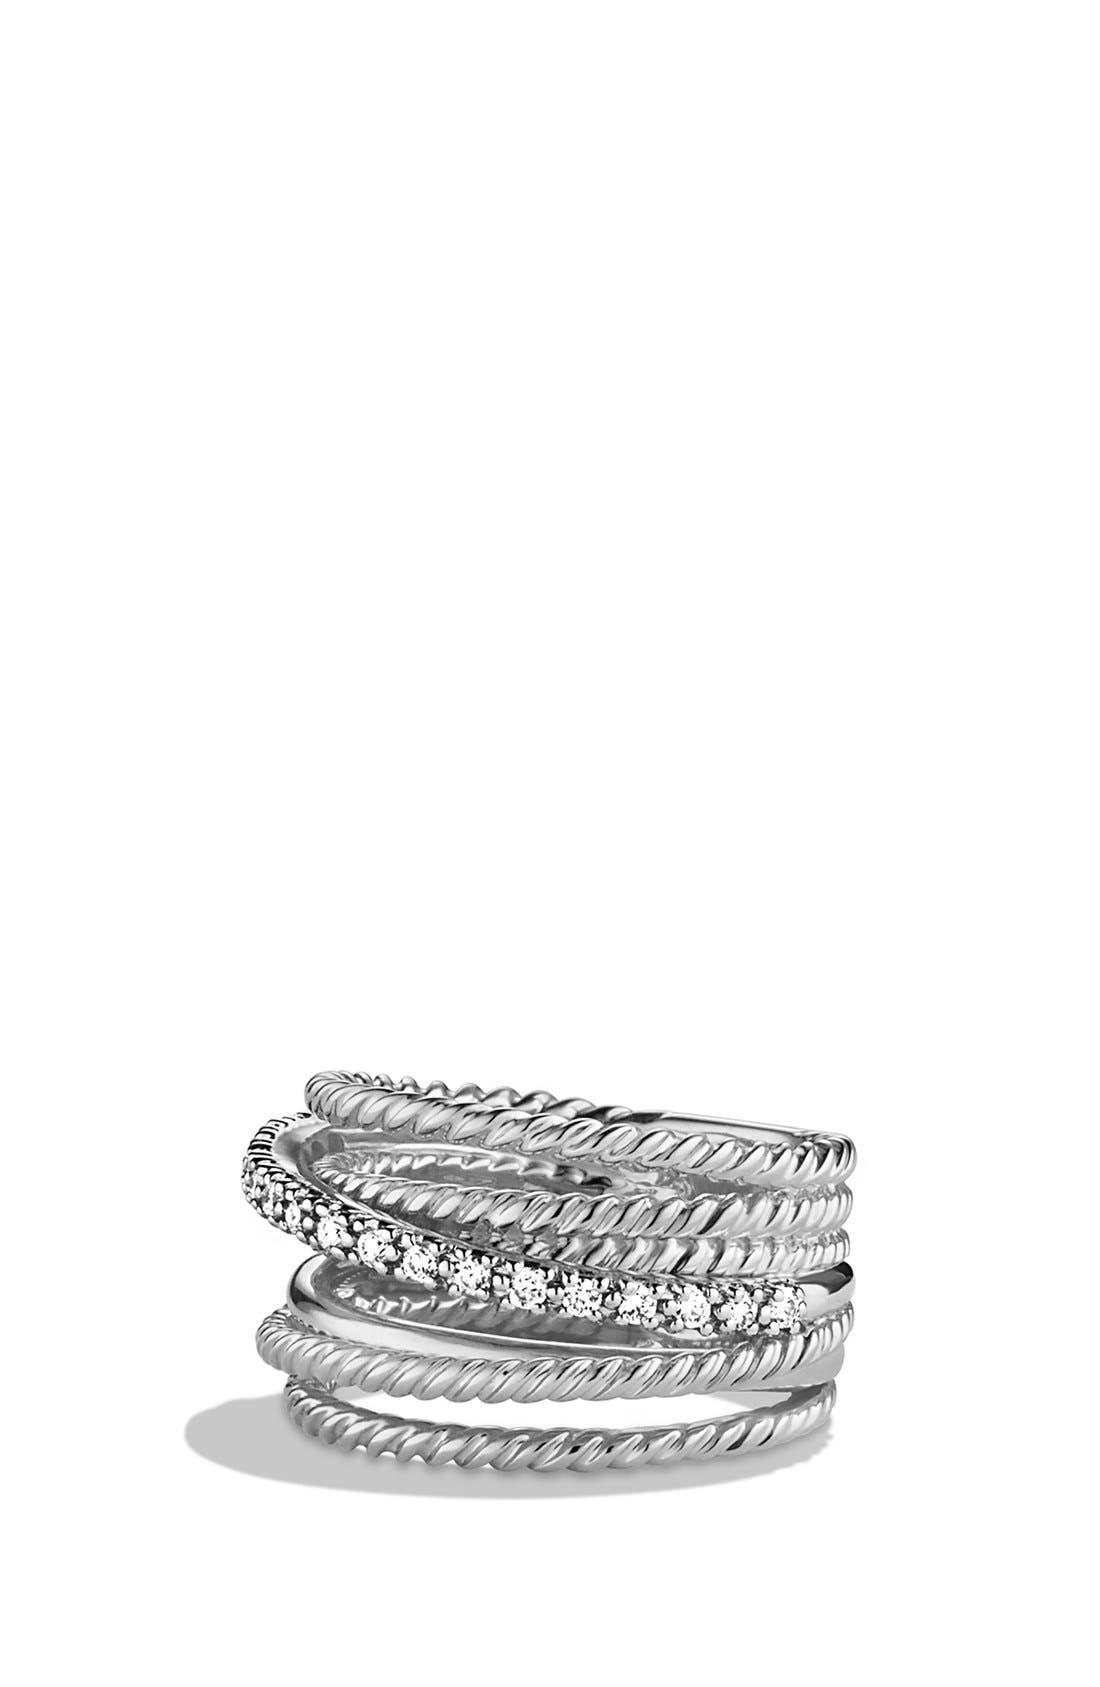 Main Image - David Yurman 'Crossover' Wide Ring with Diamonds